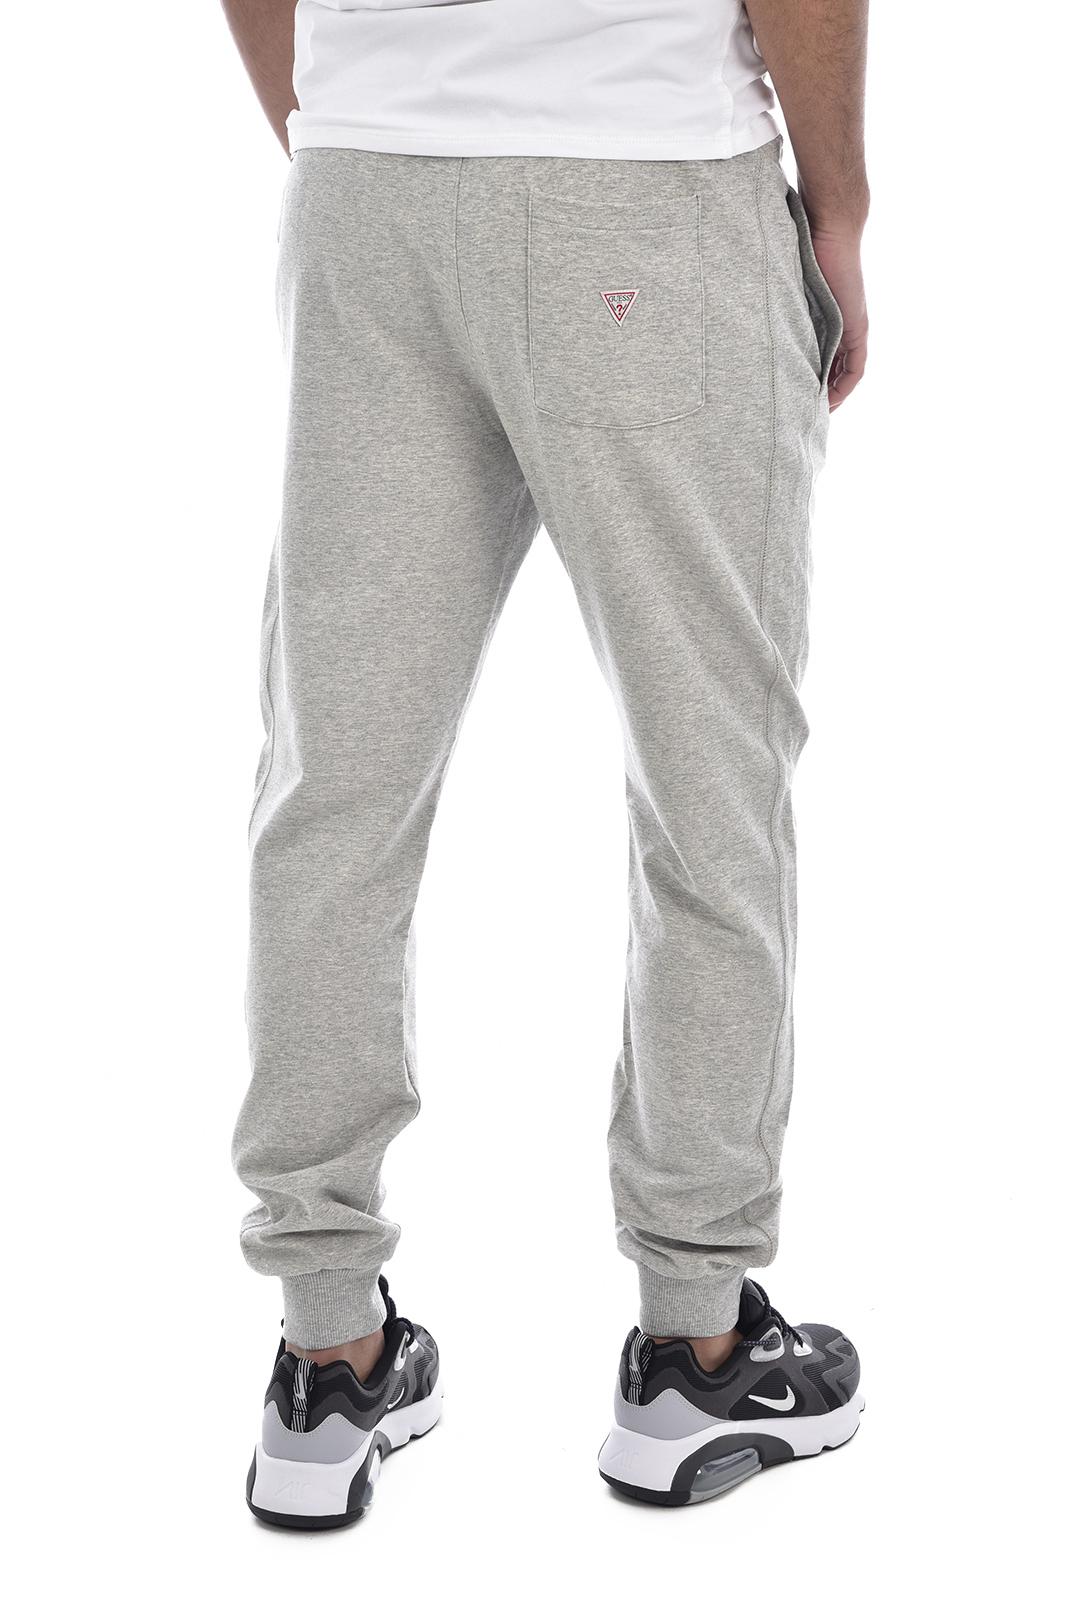 Pantalons sport/streetwear  Guess jeans M02B37 K6ZS0 ADAM LHYLIGHT HEATHER GREY M